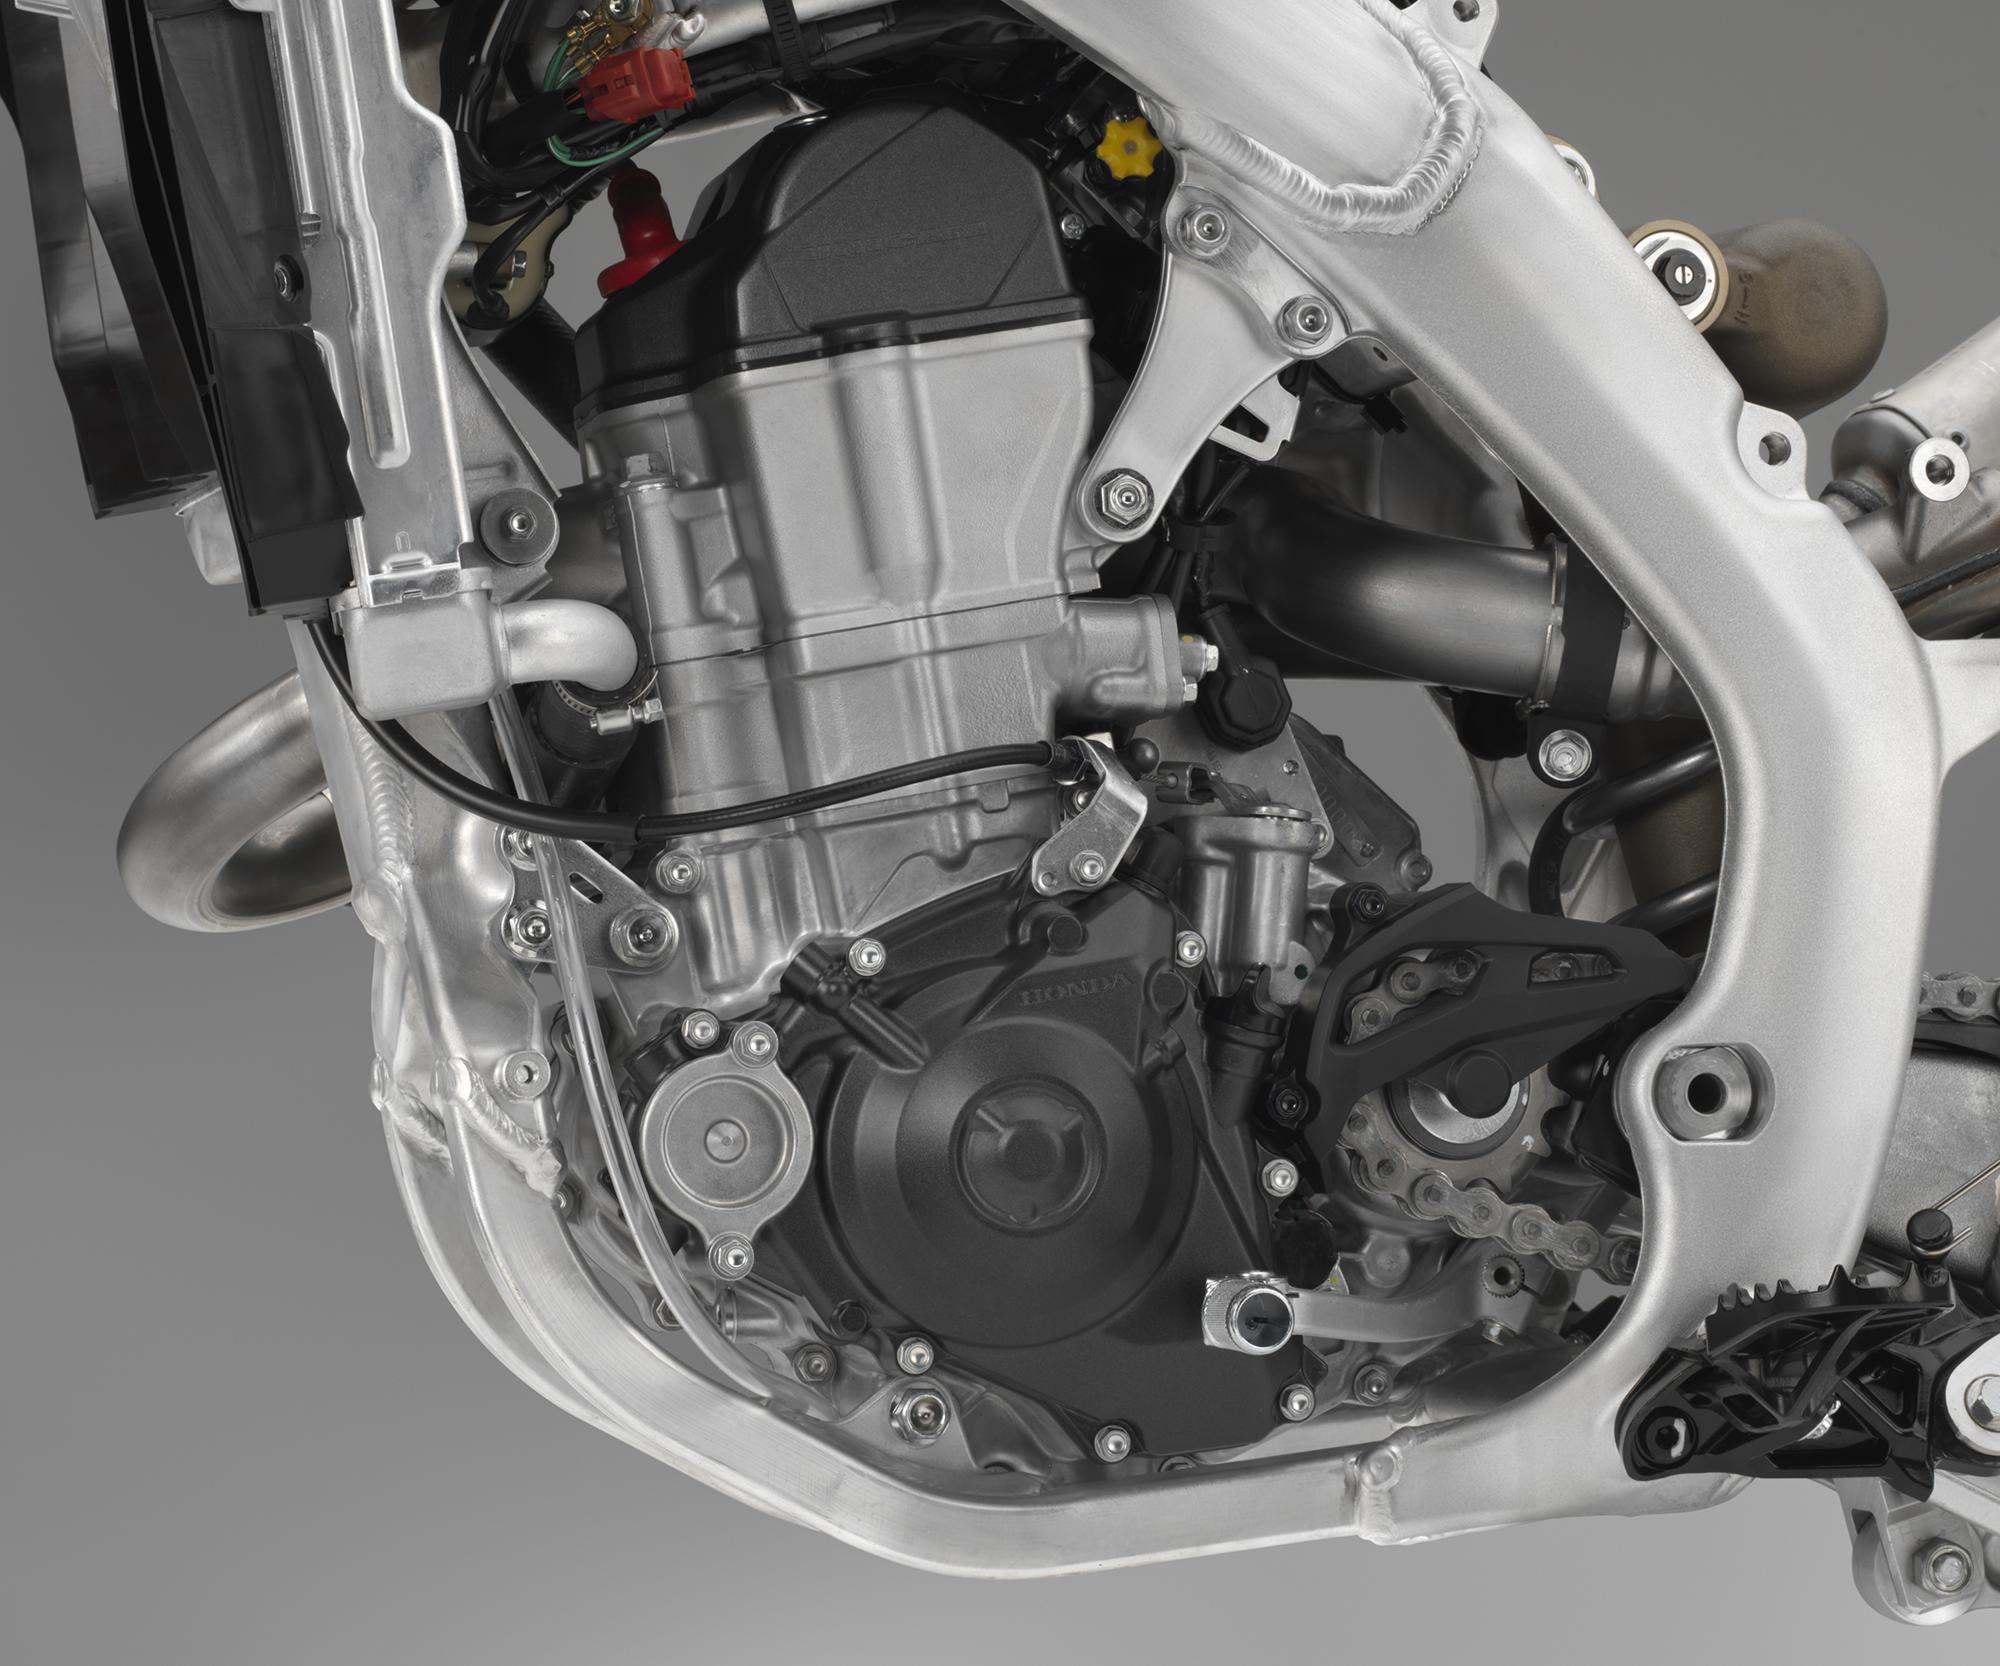 19 Honda CRF450RX_engine L.jpg